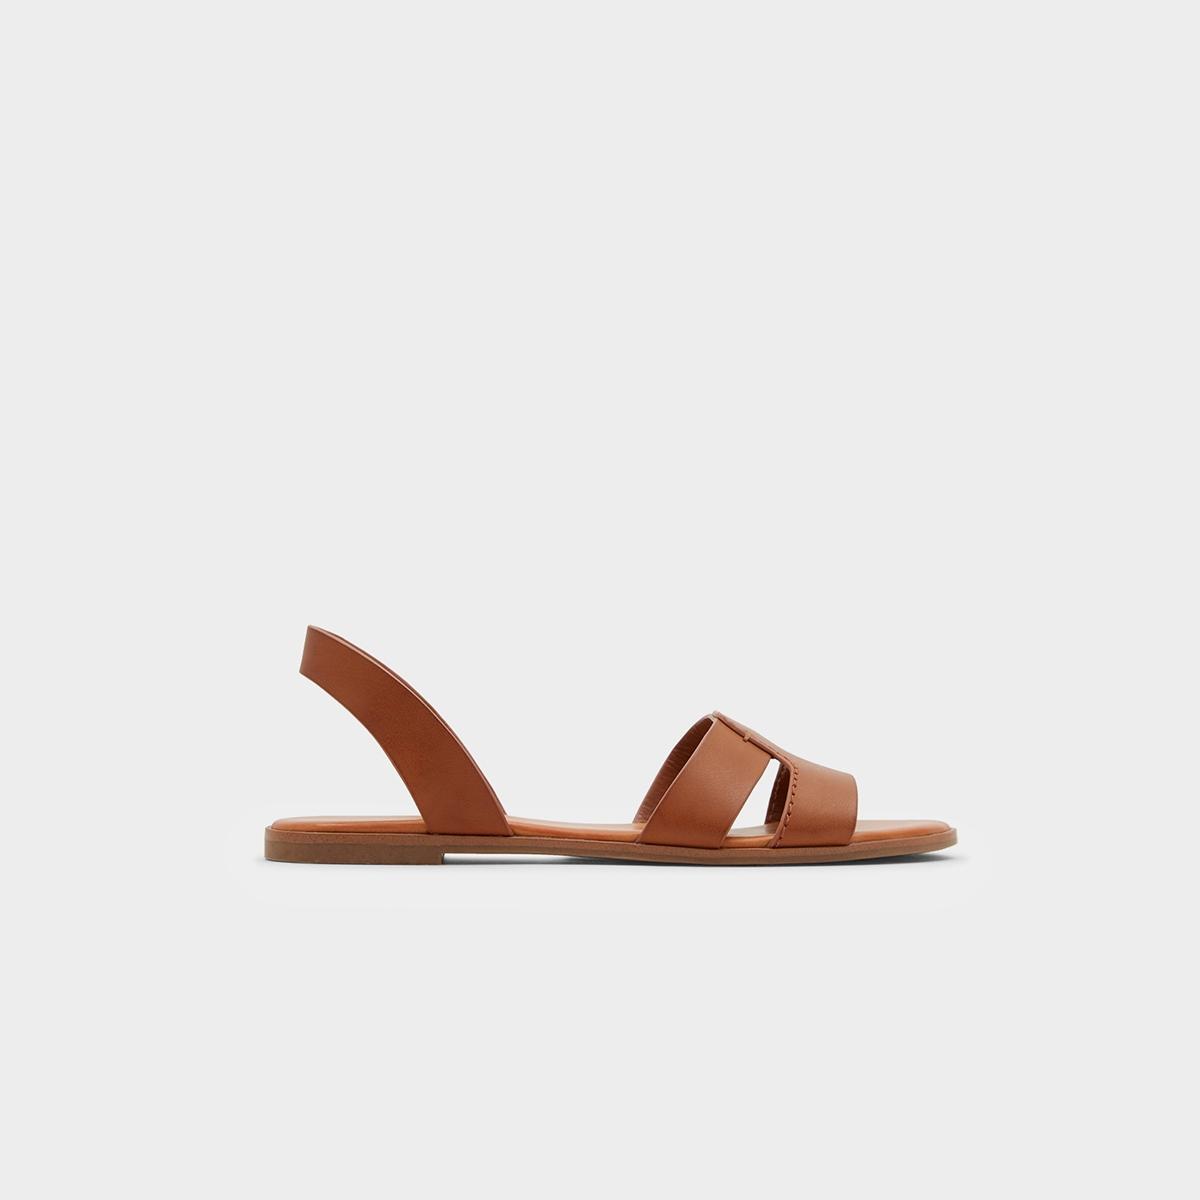 Aldo Terima Sandals Dark Brown